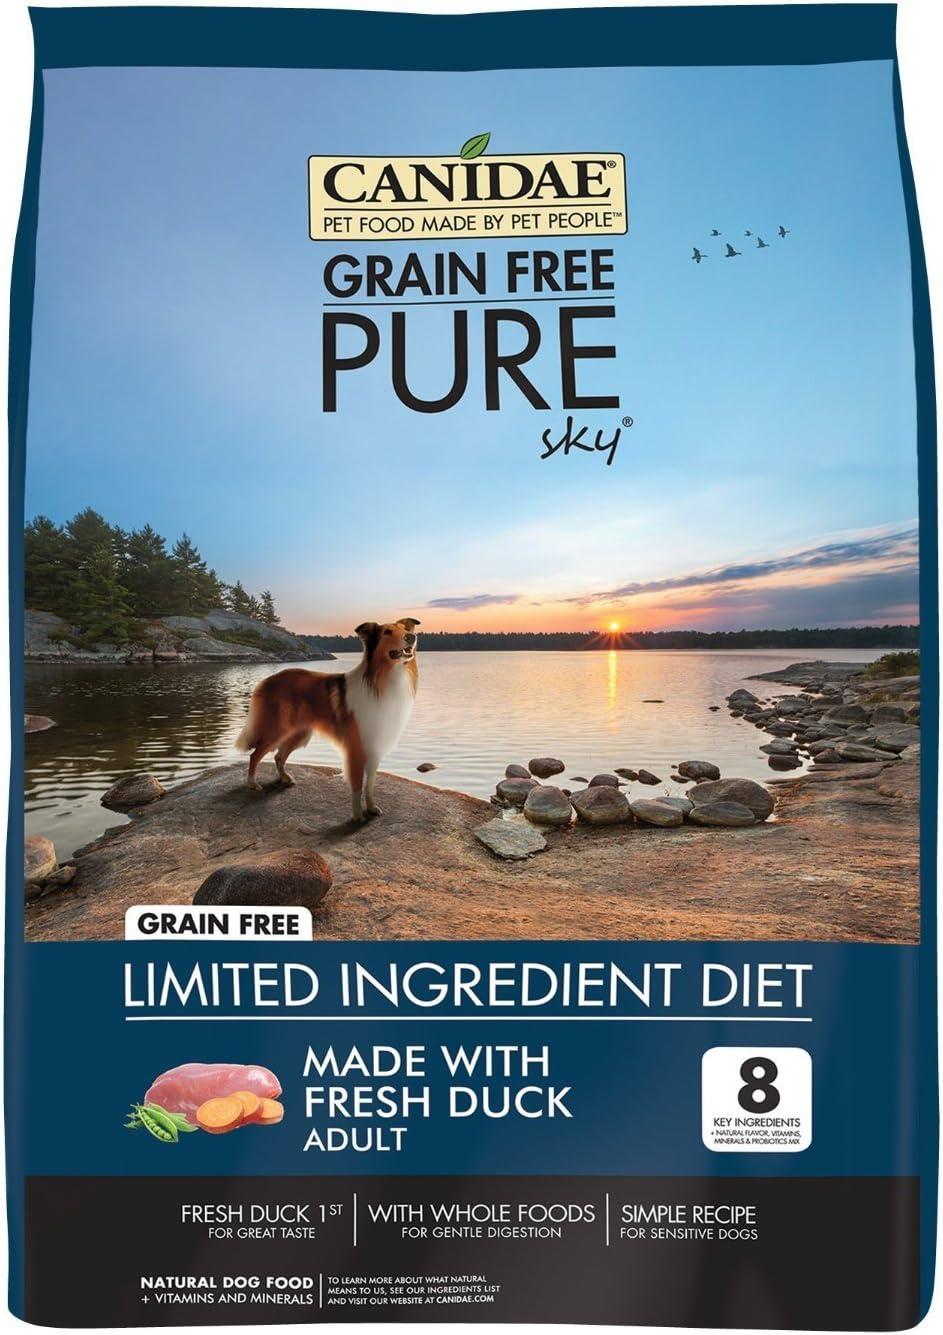 CANIDAE Grain Free Pure Sky Adult Dog Food, 4 lbs.